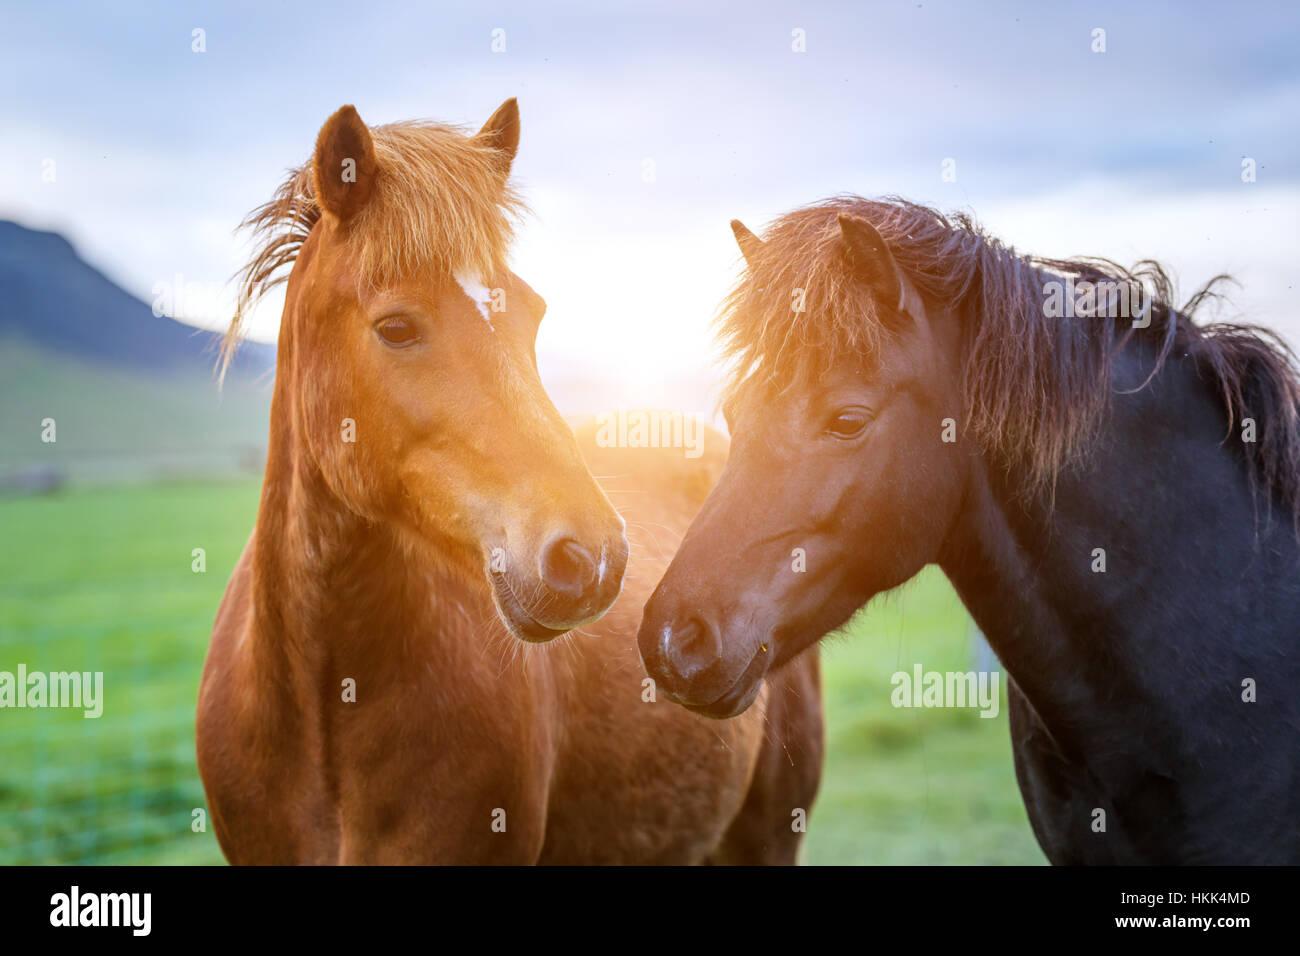 Icelandic horse portrait close up - Stock Image